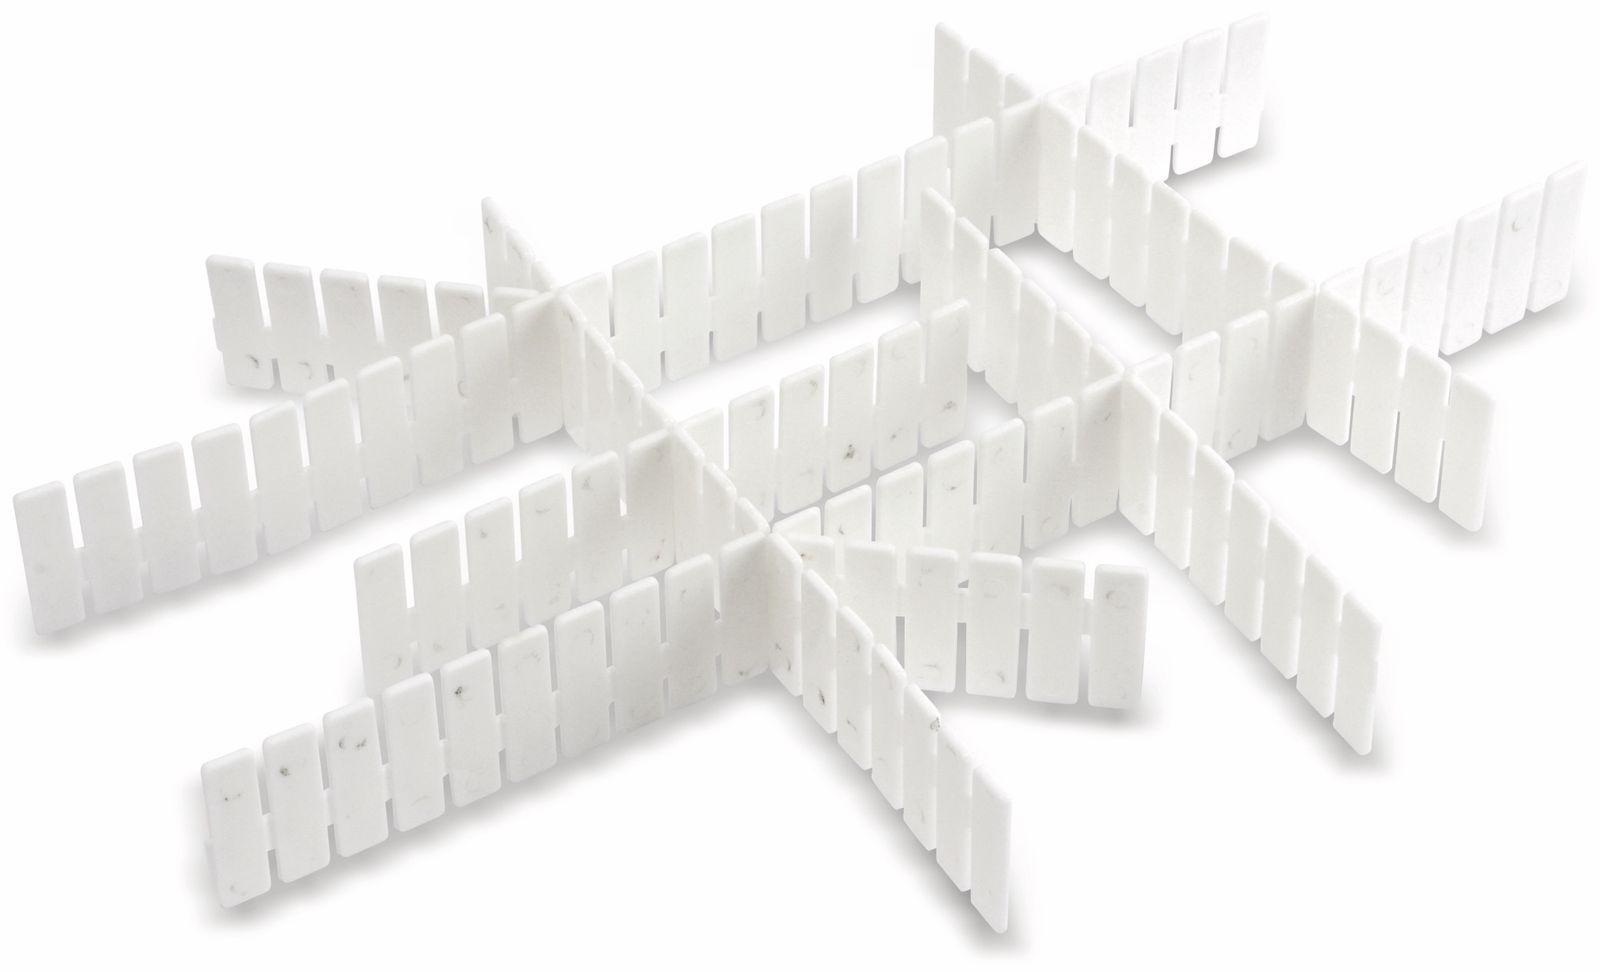 schubladentrenner 40x4 cm 4 st ck online kaufen. Black Bedroom Furniture Sets. Home Design Ideas